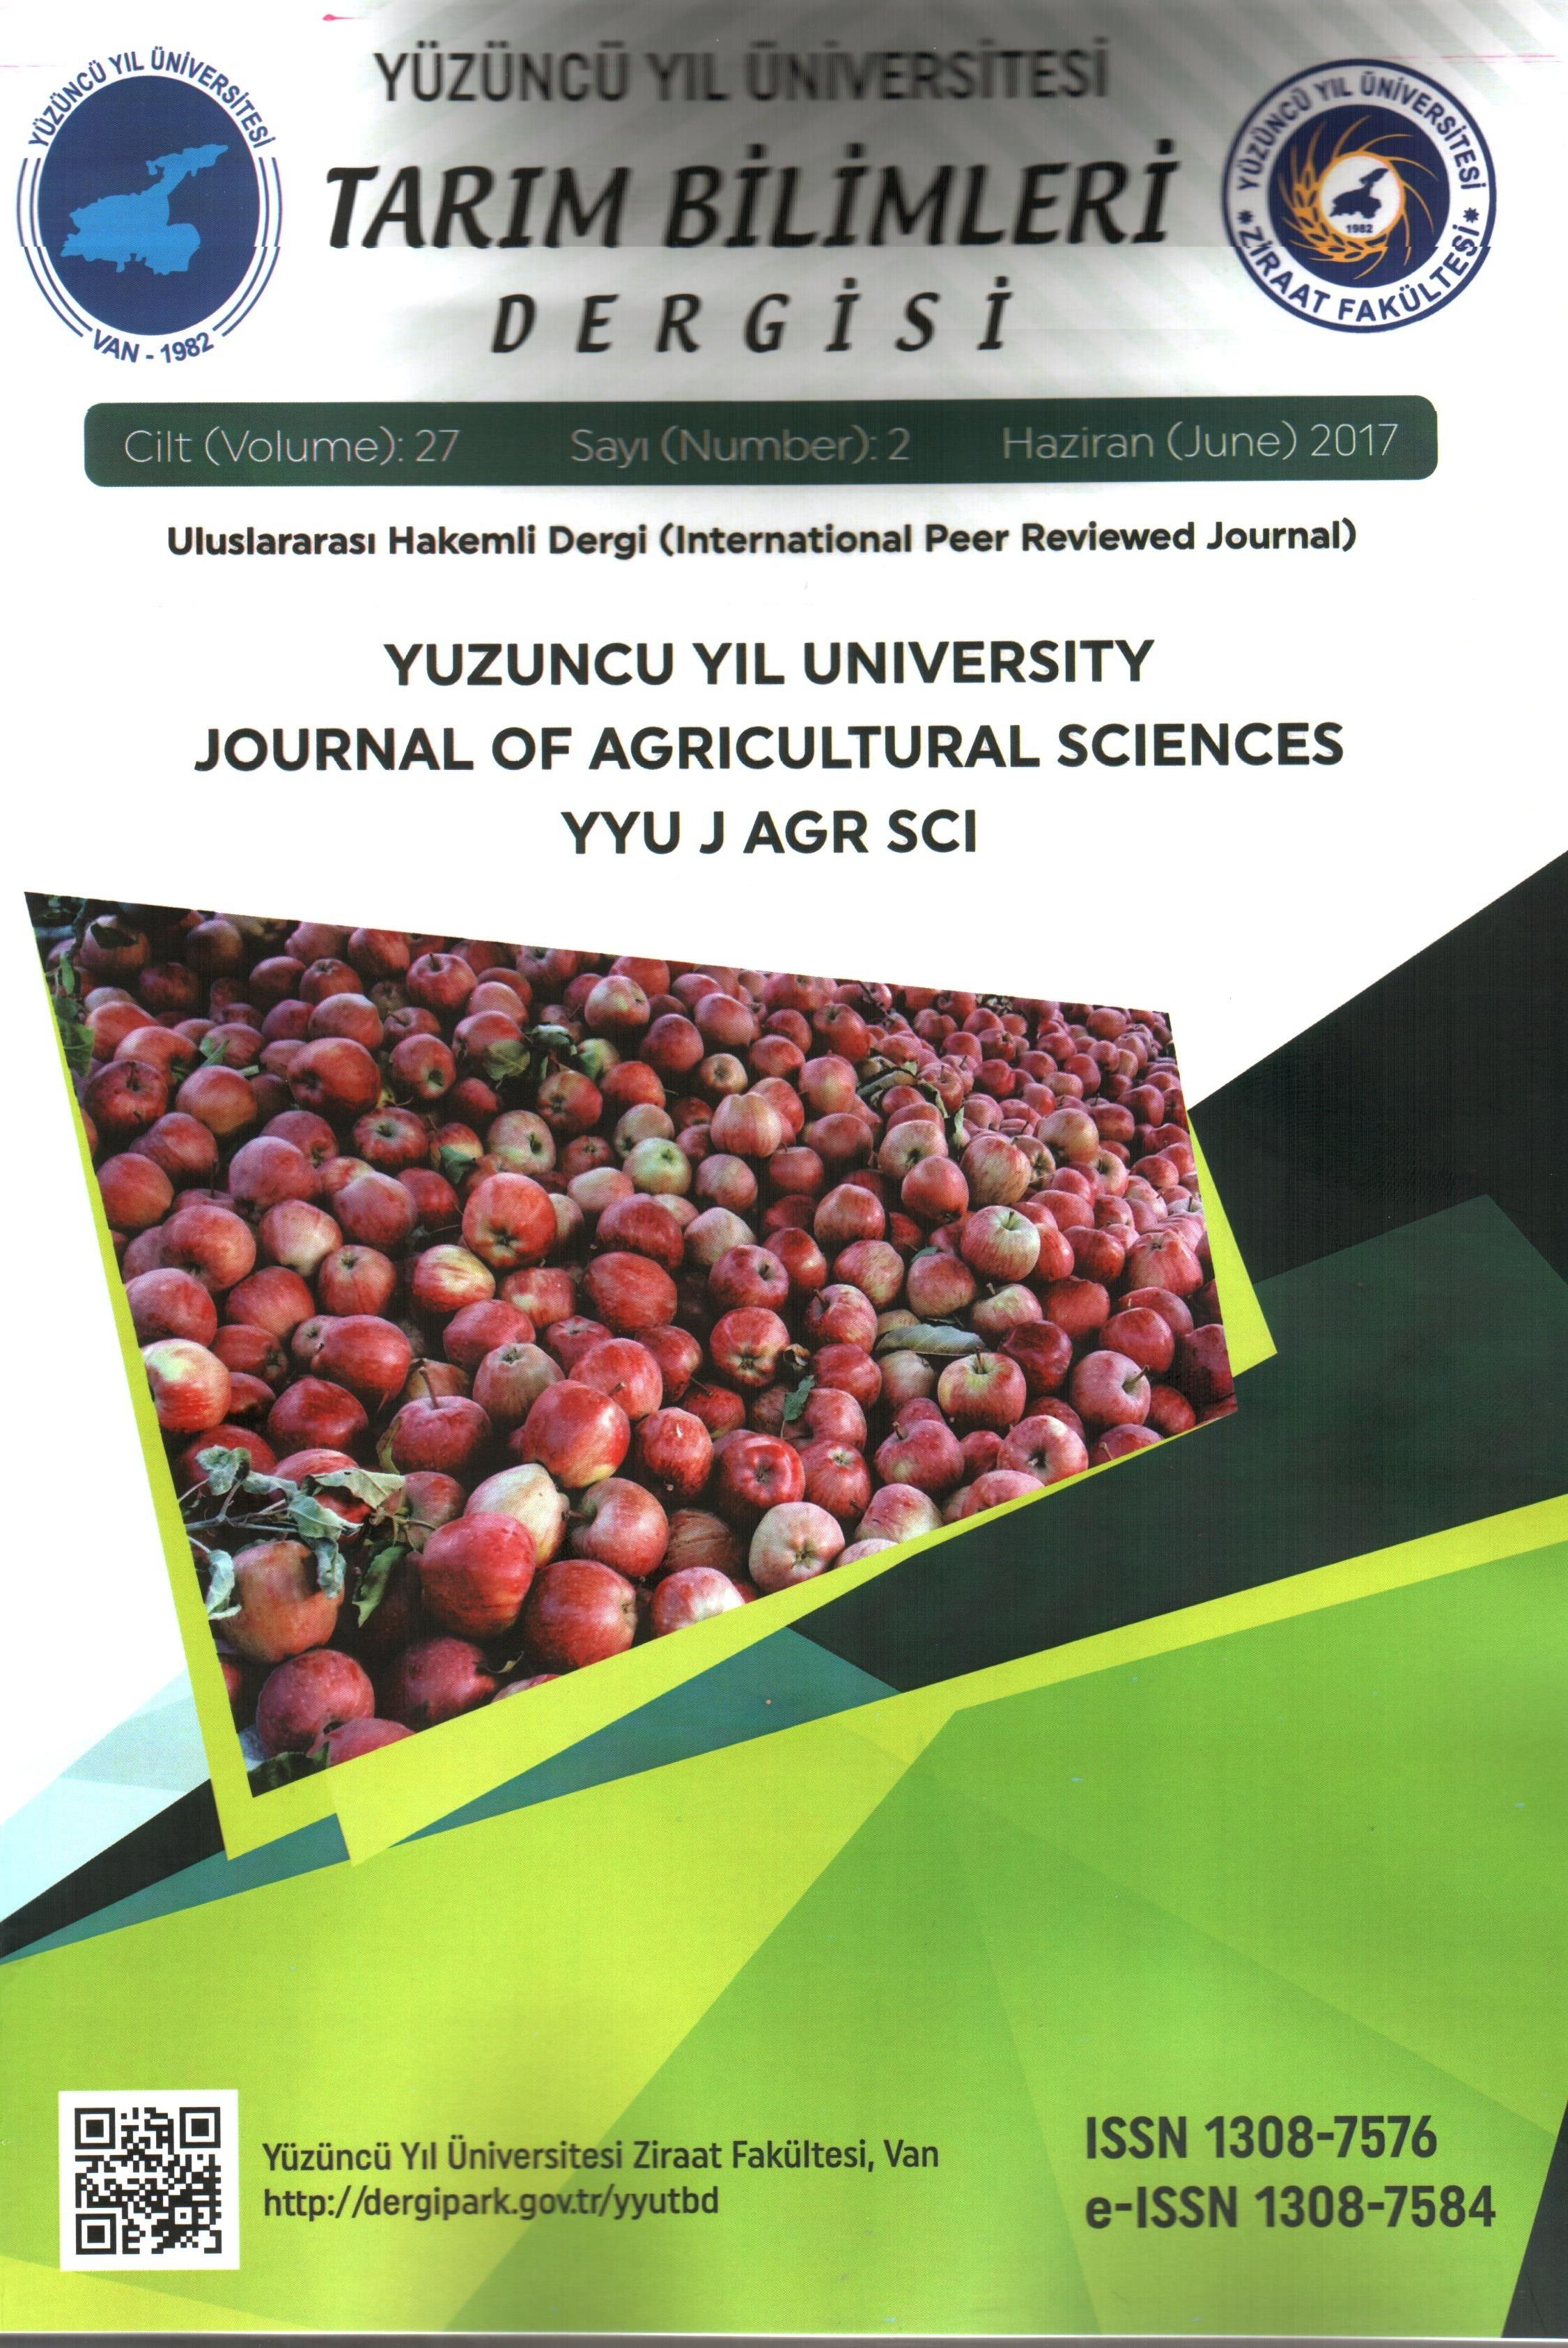 Yuzuncu Yıl University Journal of Agricultural Sciences